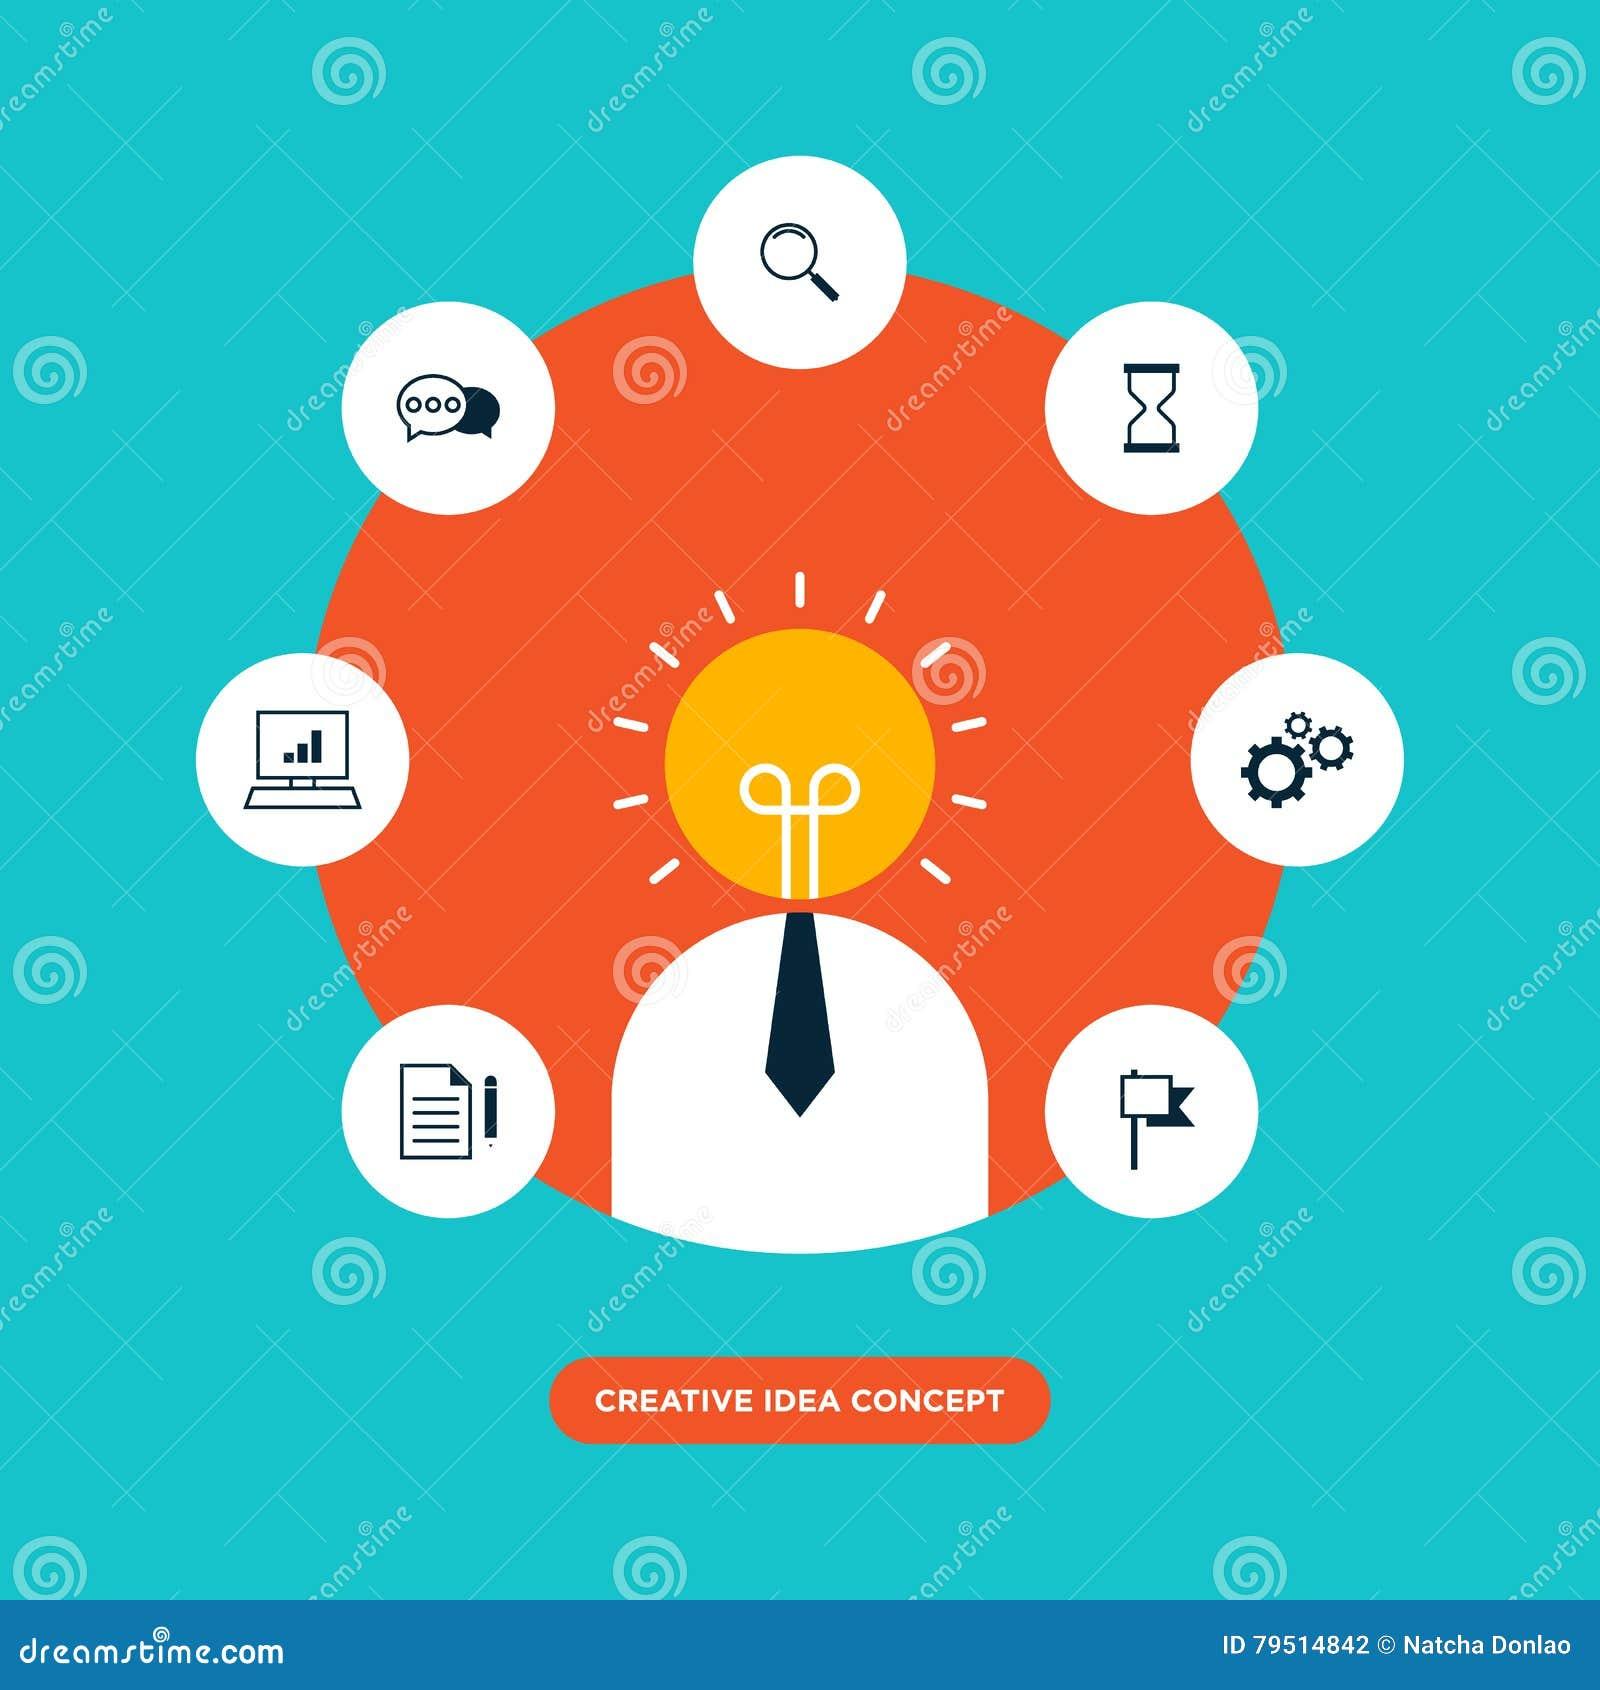 Creative Idea Concept Inspiration Process Flat Design Illustration